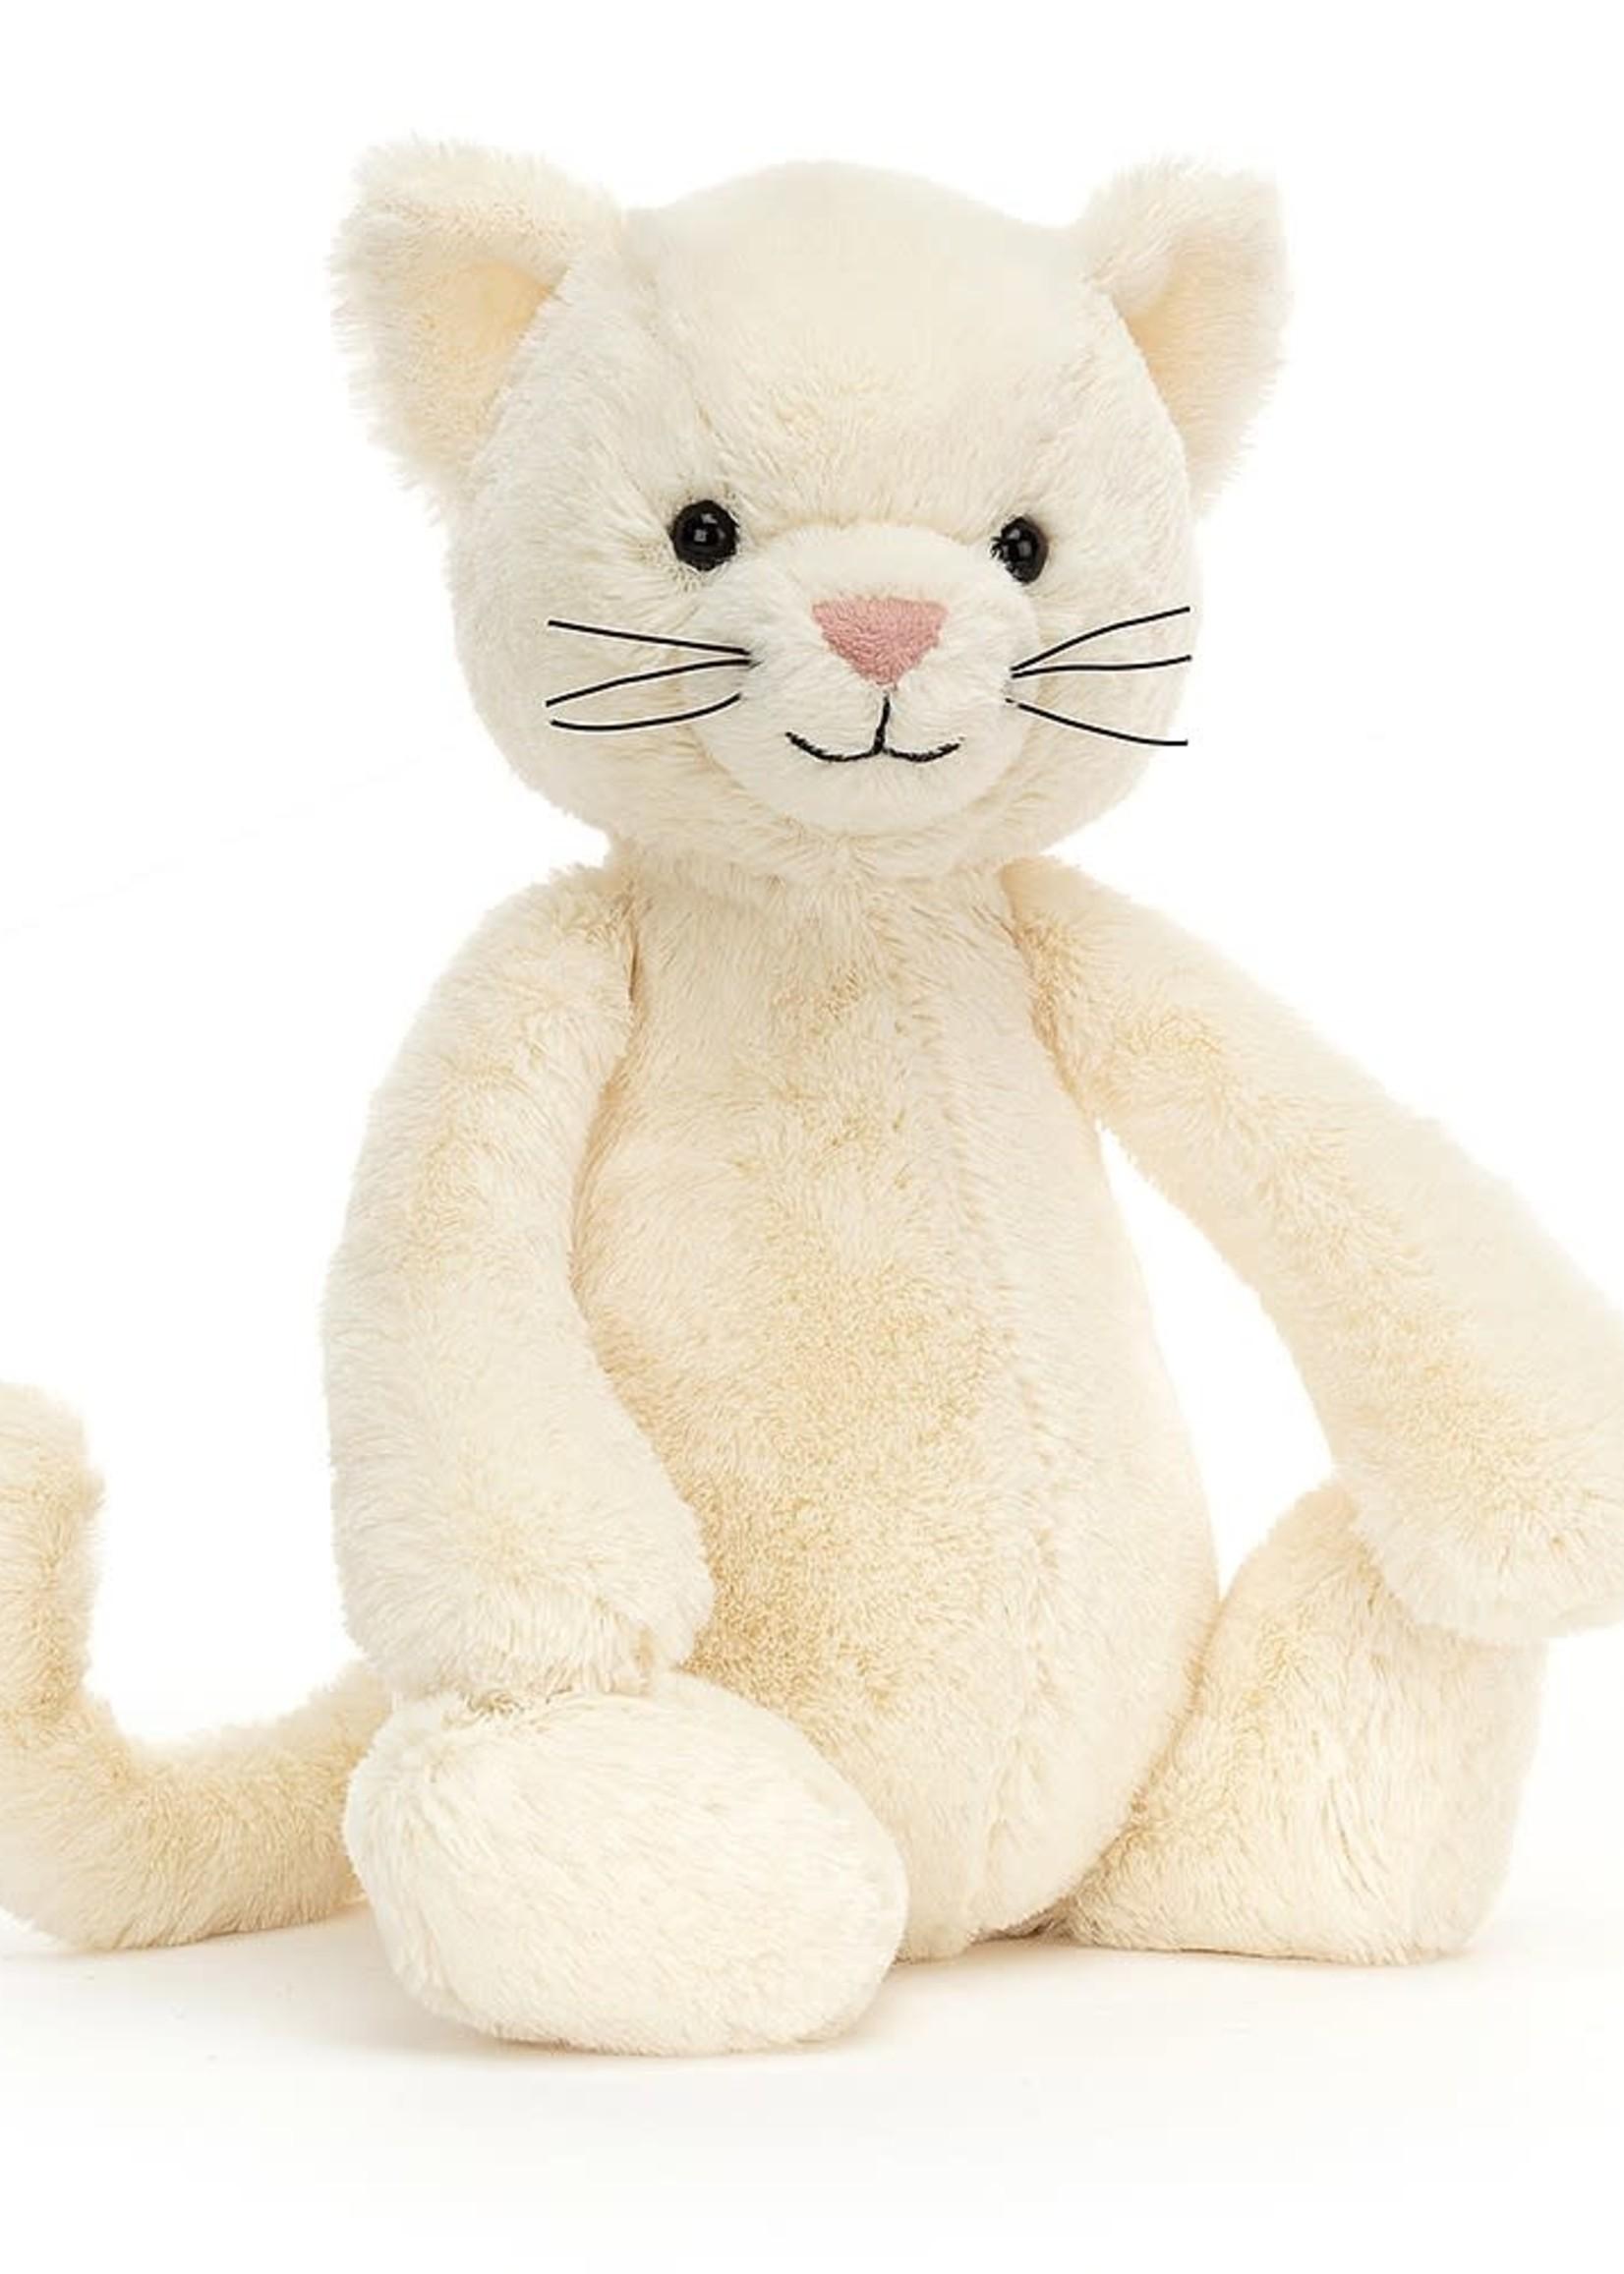 Jellycat JC Medium Bashful Kitten (Cream)